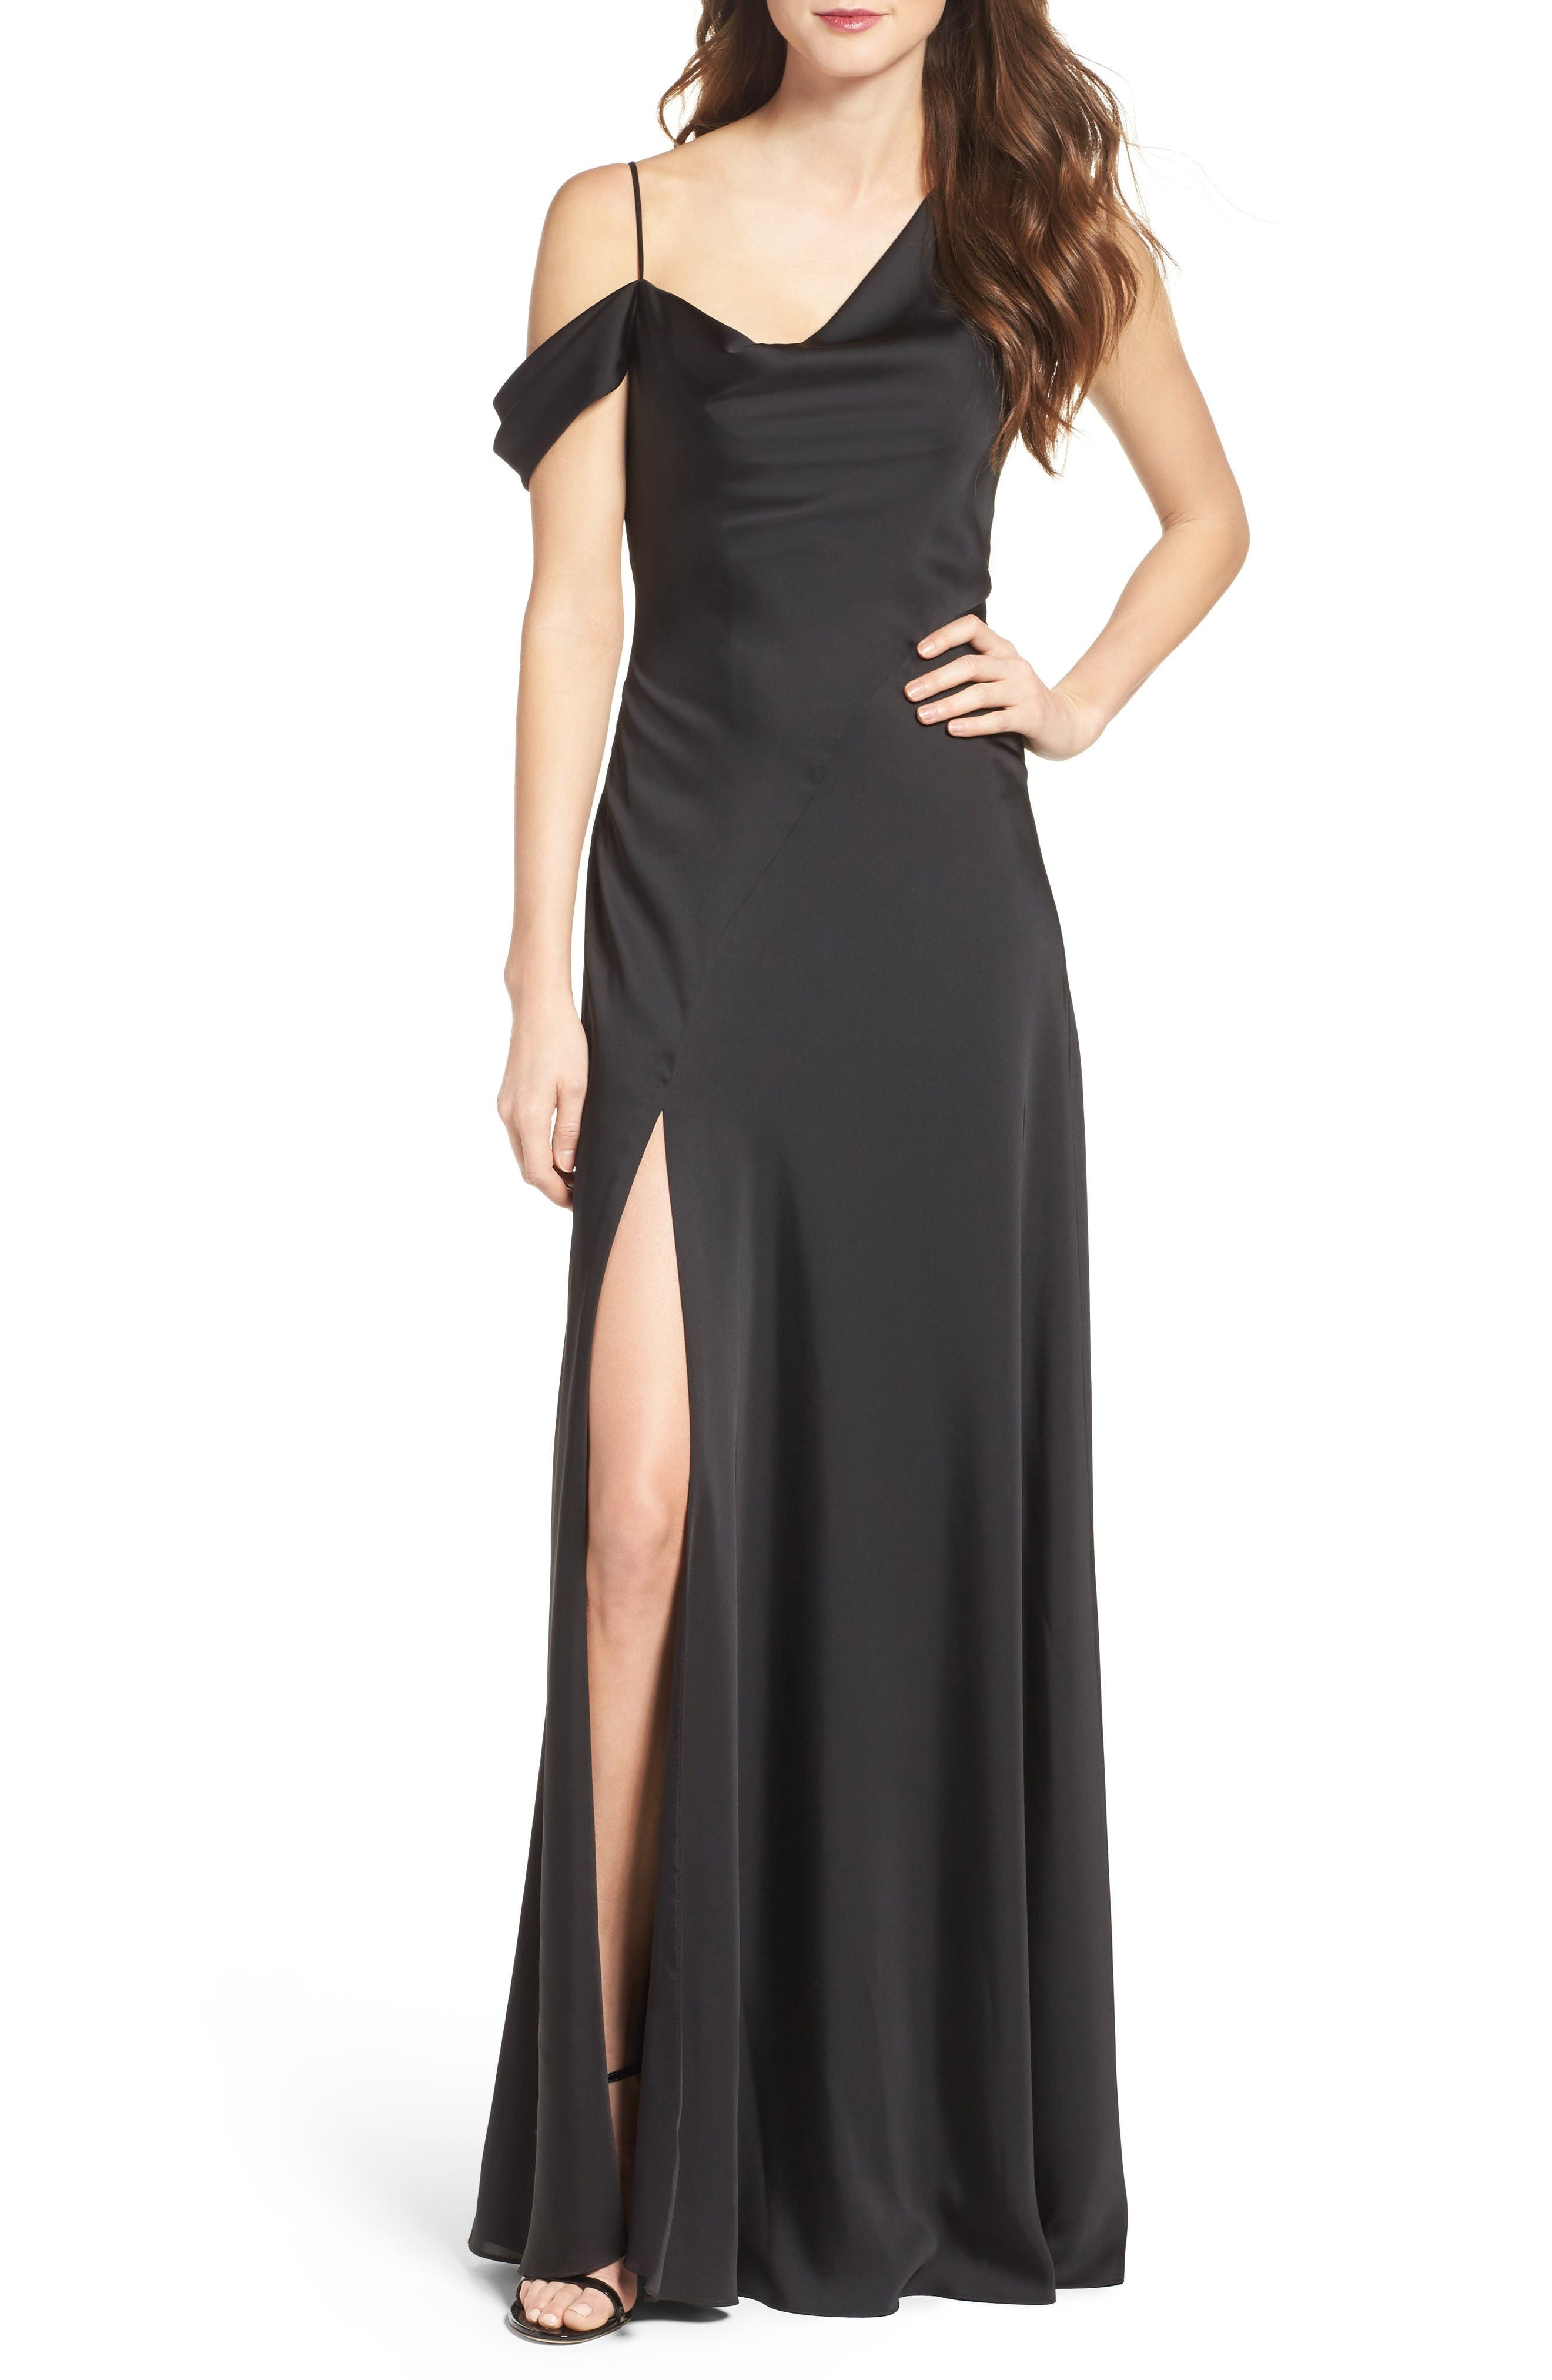 Alternate Image 1 Selected - Jill Jill Stuart One-Shoulder Gown